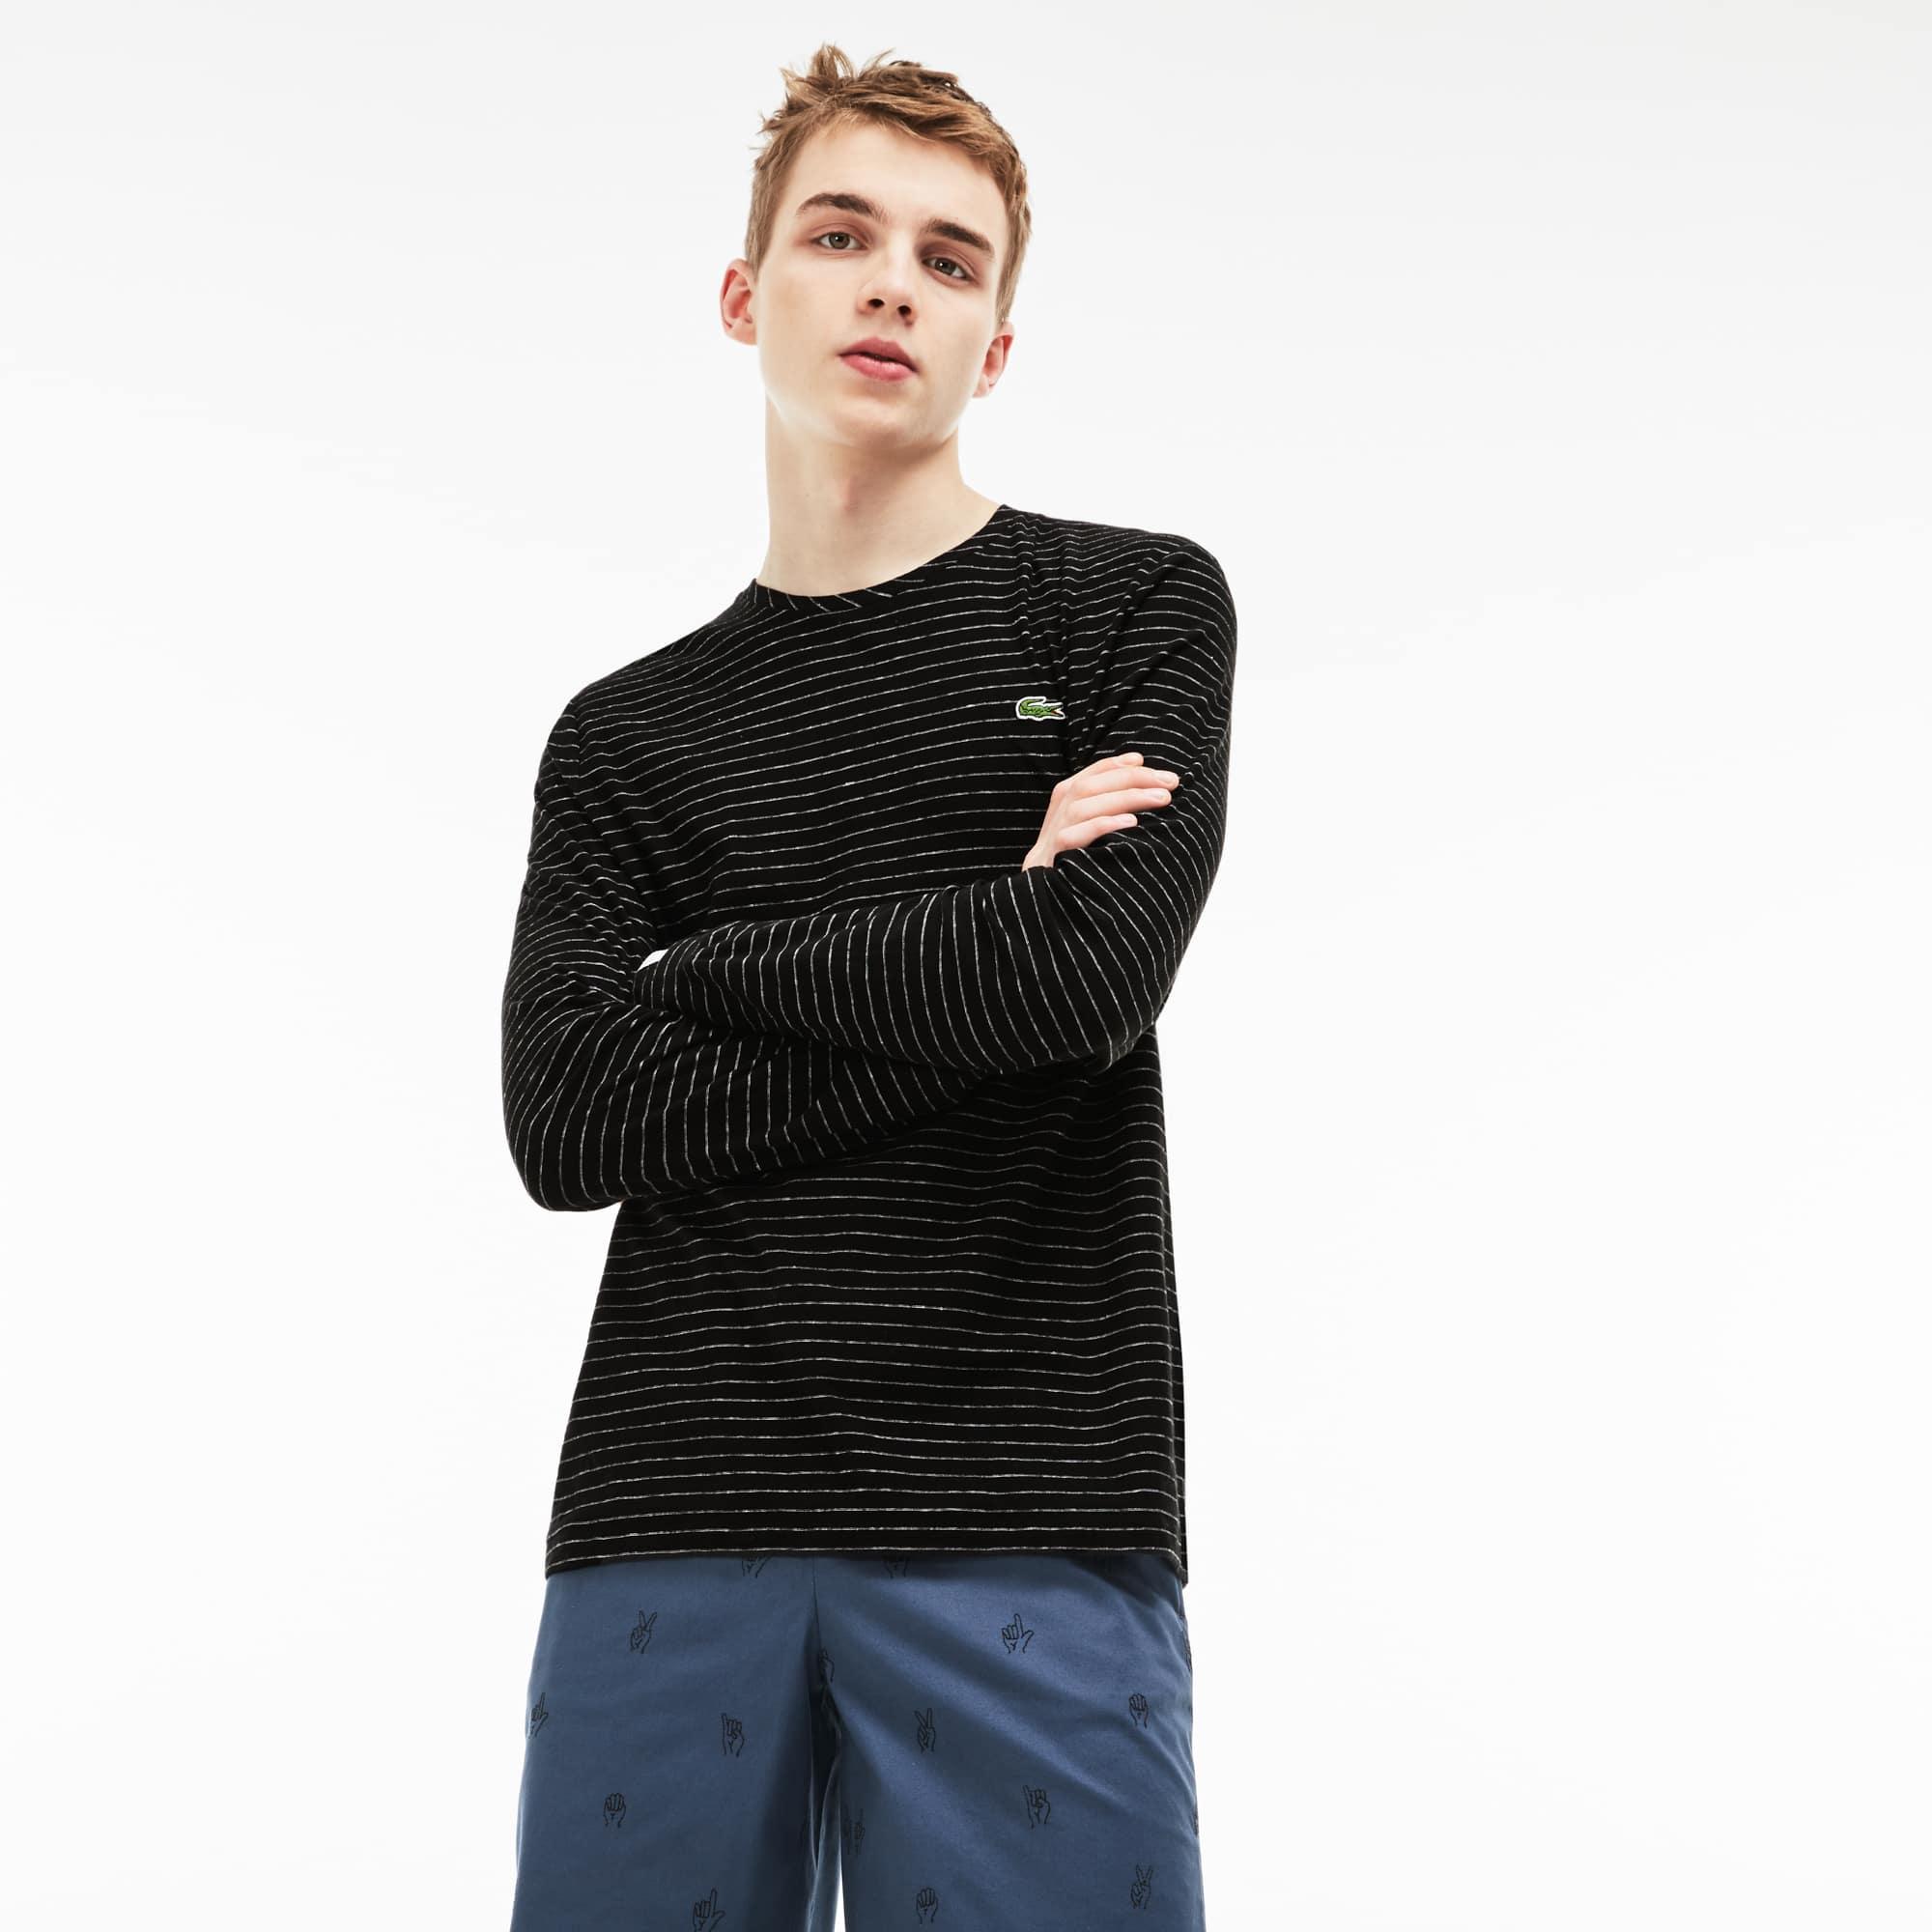 Herren-T-Shirt aus Baumwoll-Leinen-Jersey LACOSTE L!VE